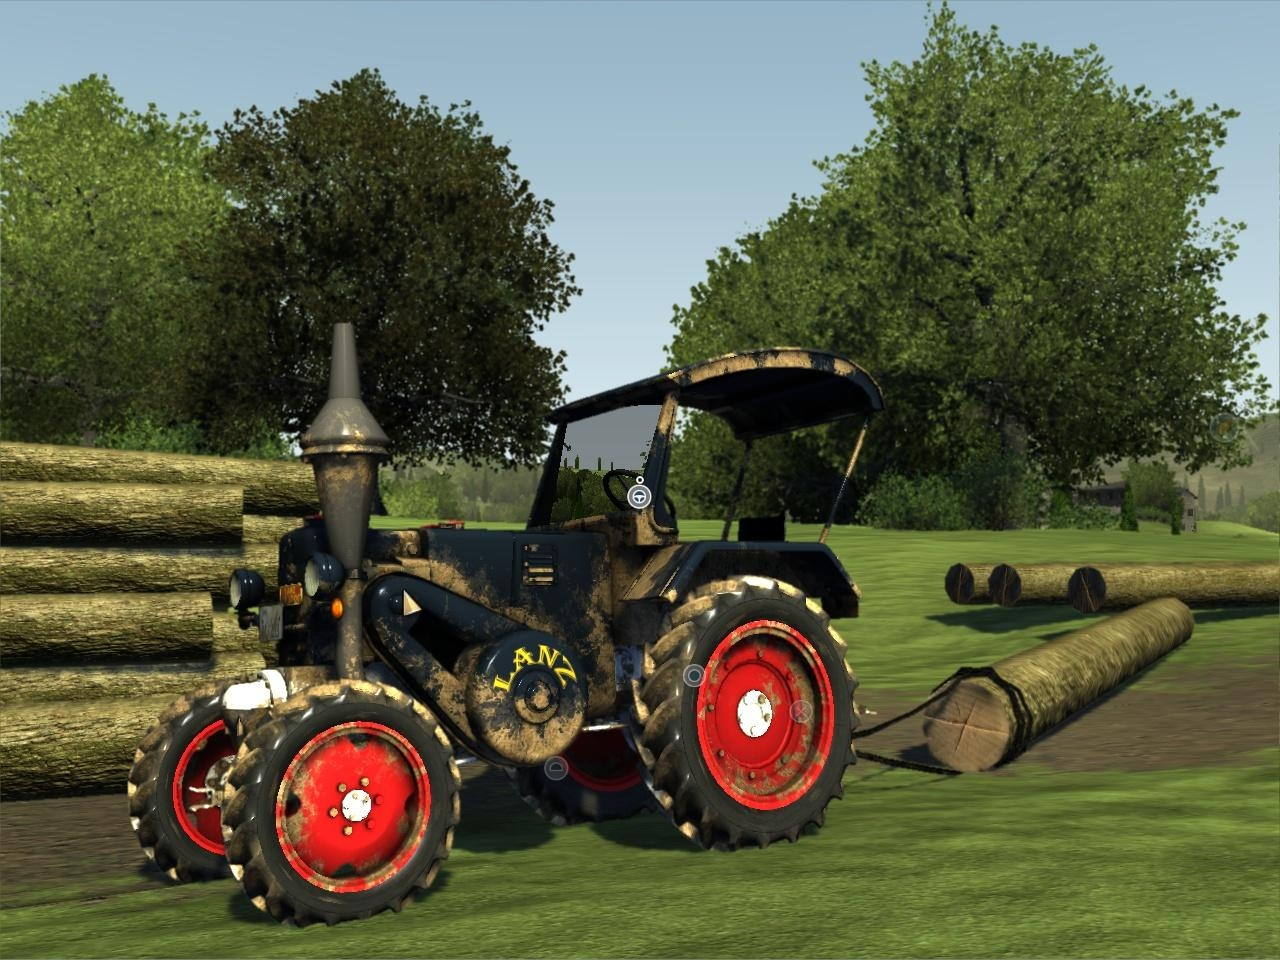 http://1.bp.blogspot.com/-fxHTghifY5Y/T8RCH-Dt04I/AAAAAAAADGM/FKrno2d9hPU/s1600/AGRICULTURAL+SIMULATOR+HISTORICAL+FARMING+2012_1.jpg